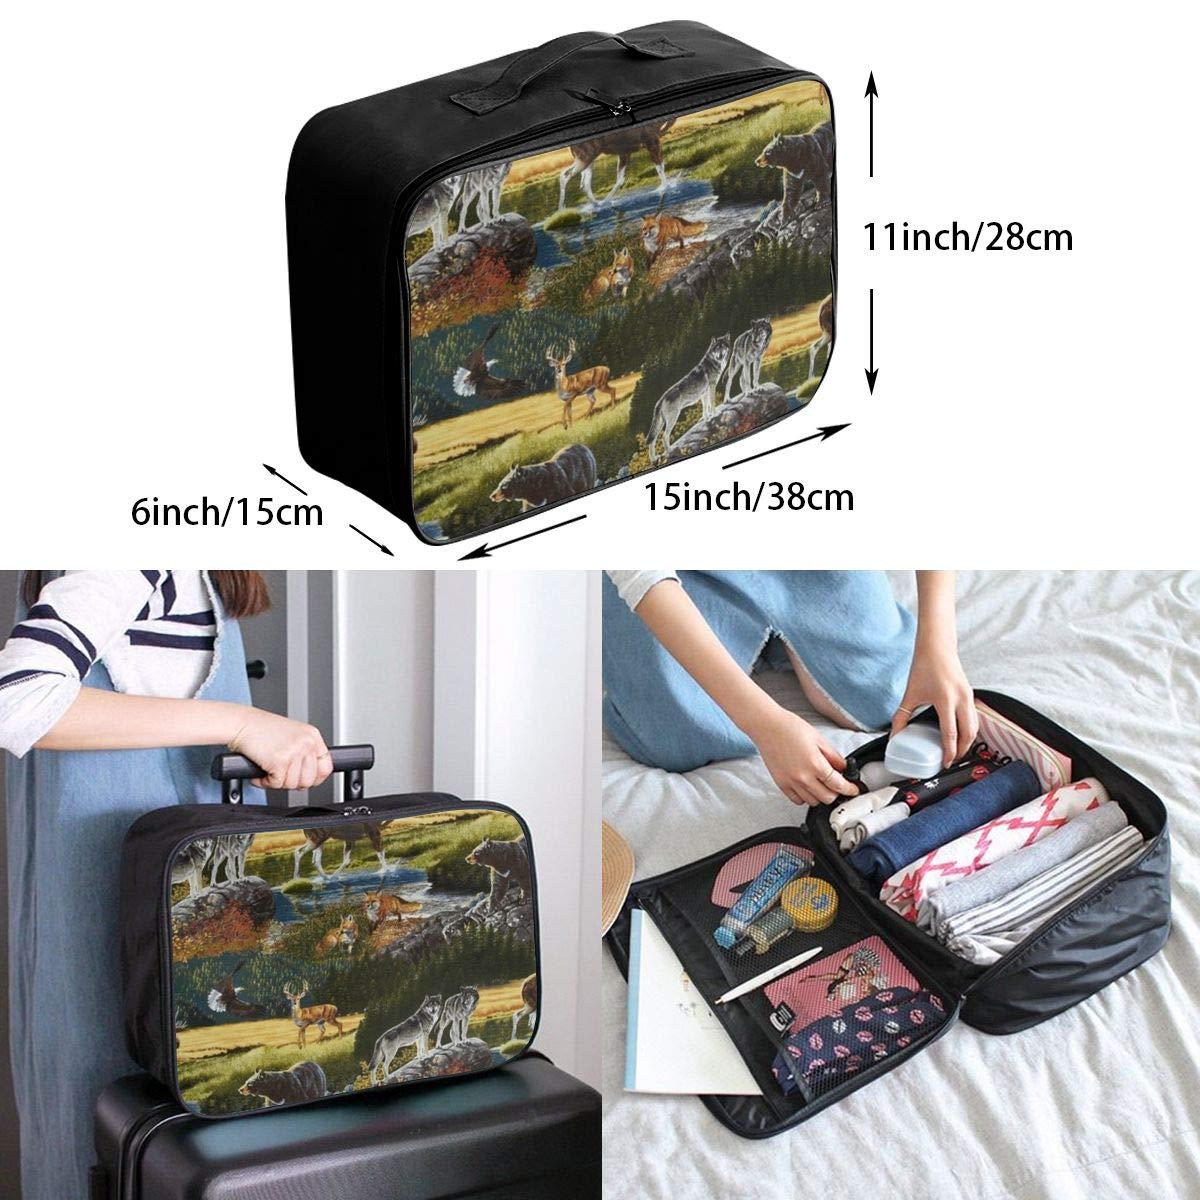 Retro Newspaper Travel Duffle Bag Large Lightweight Weekender Bag Nylon Toiletry Bag Luggage Duffel Bag For Sports Holiday Tote Bag In Trolley Handle Gym